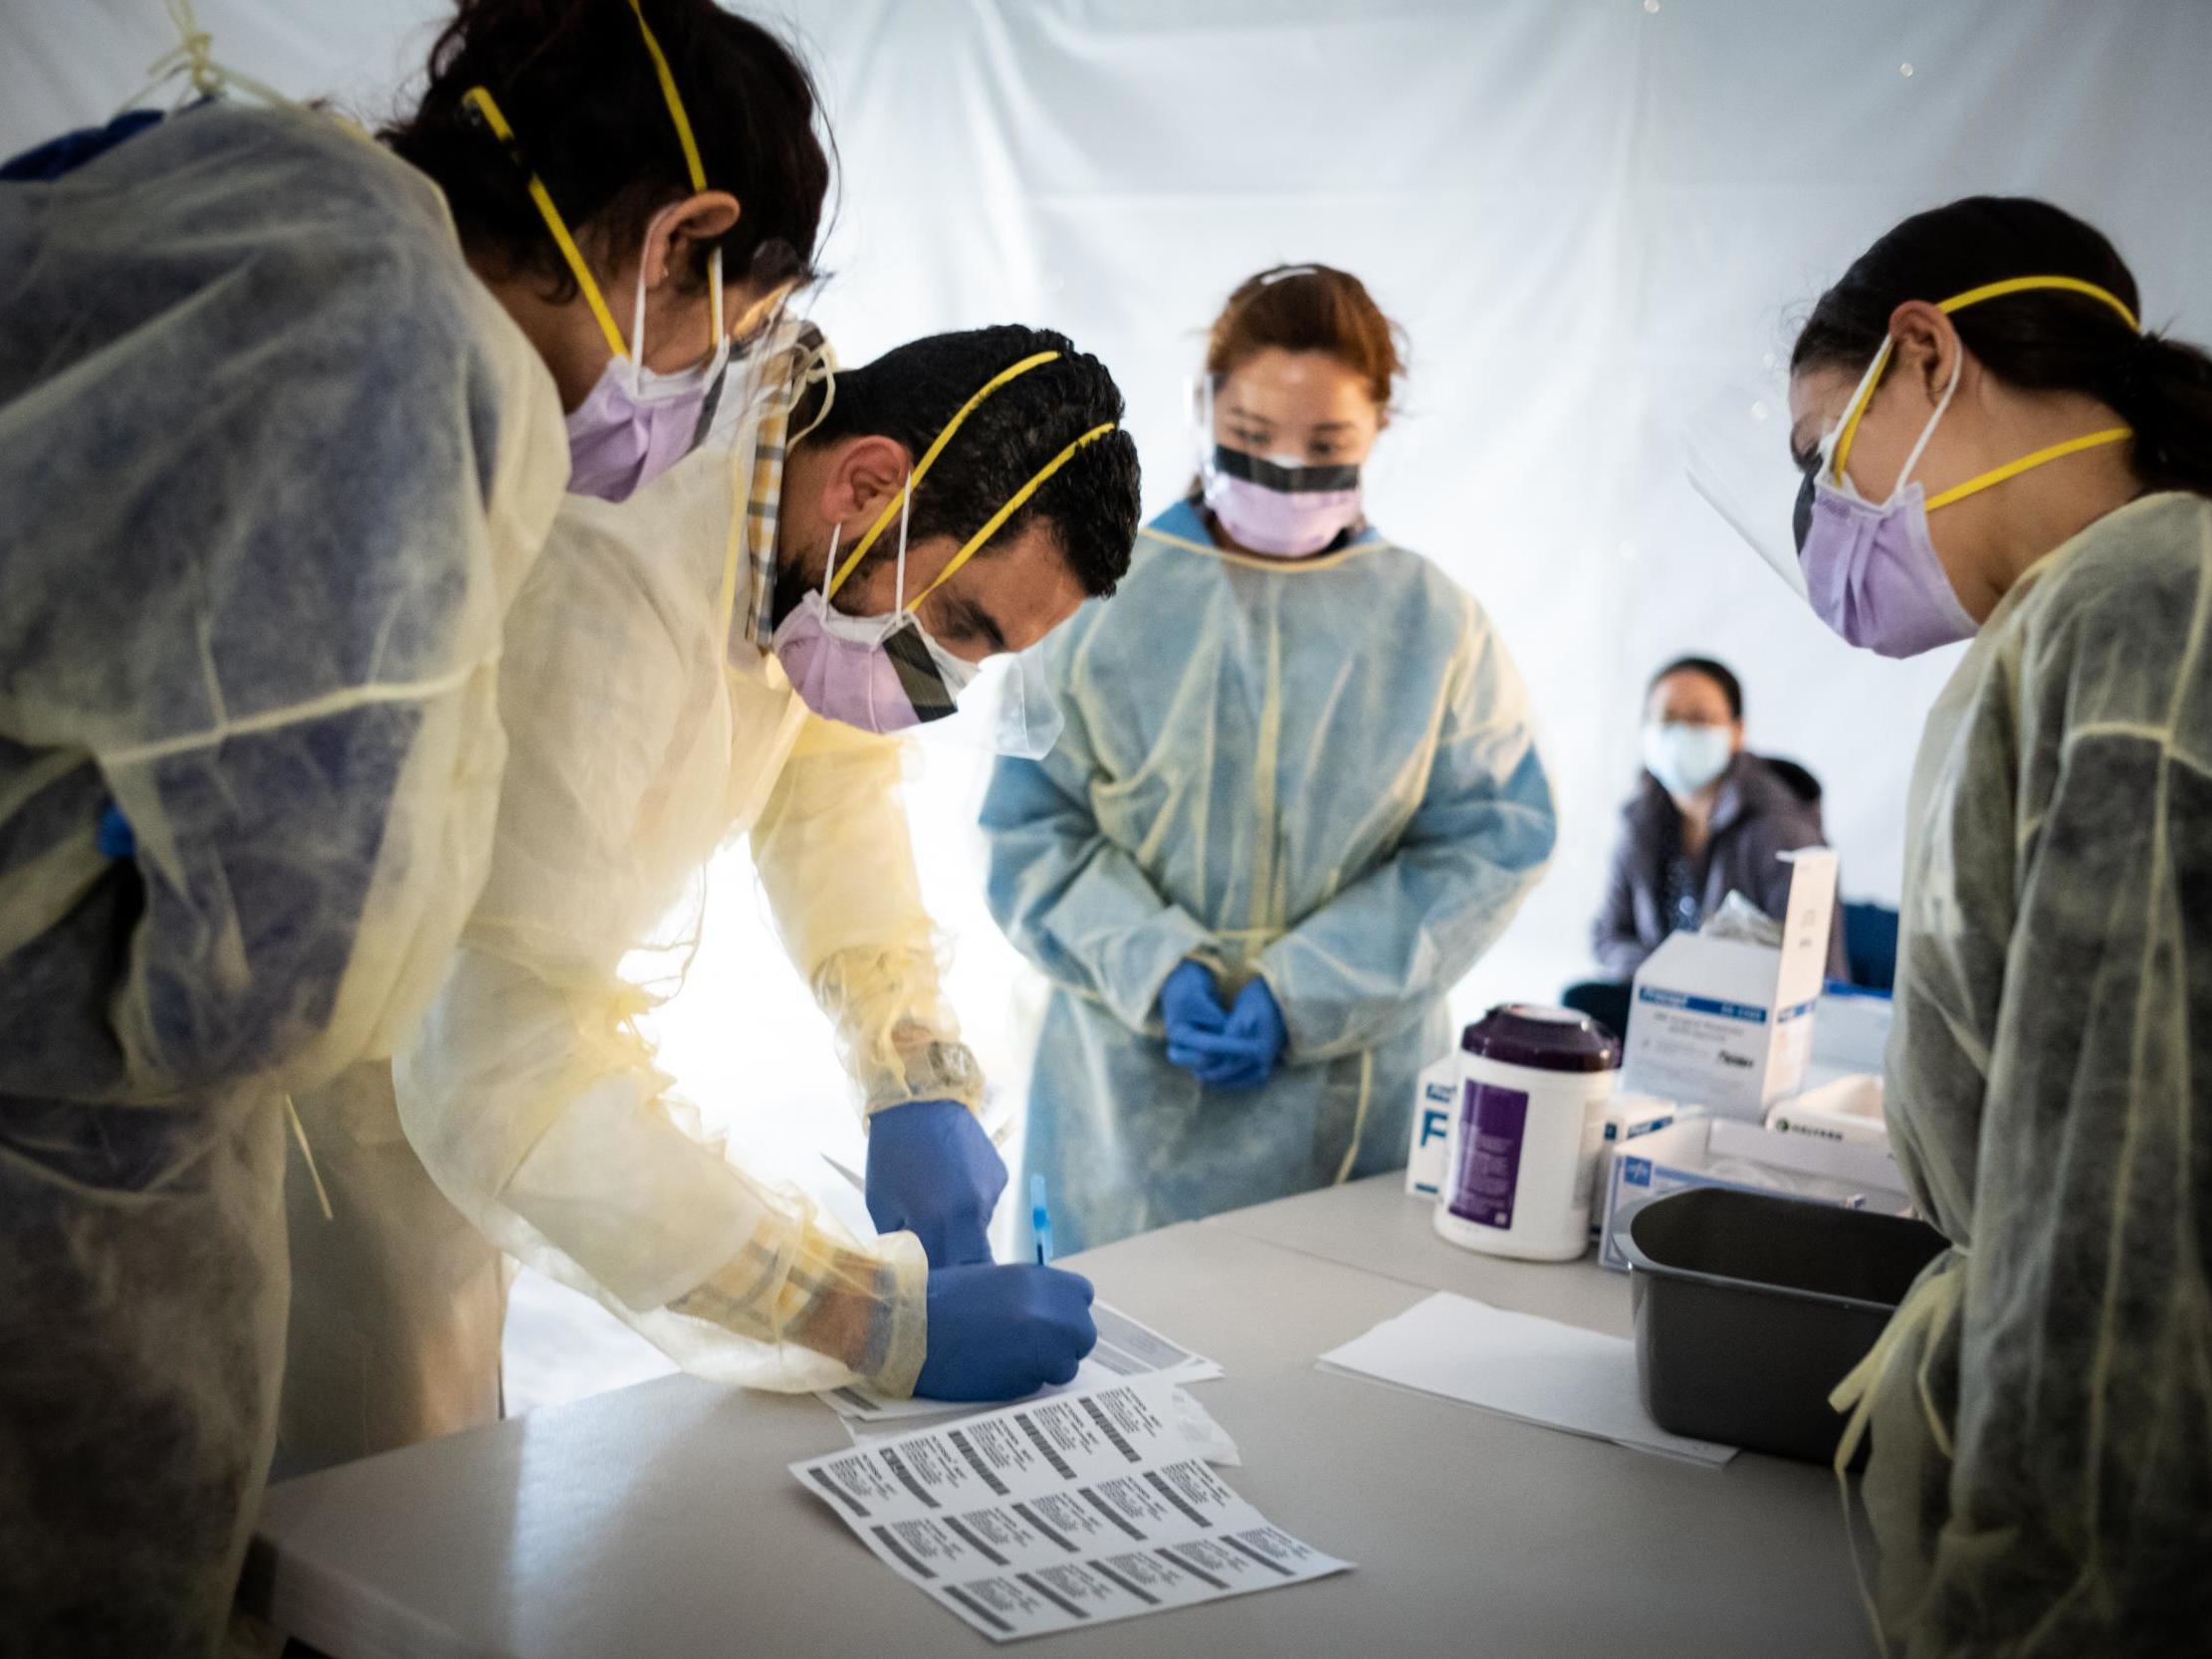 Coronavirus: New York ER doctor says city should begin easing lockdown measures photo